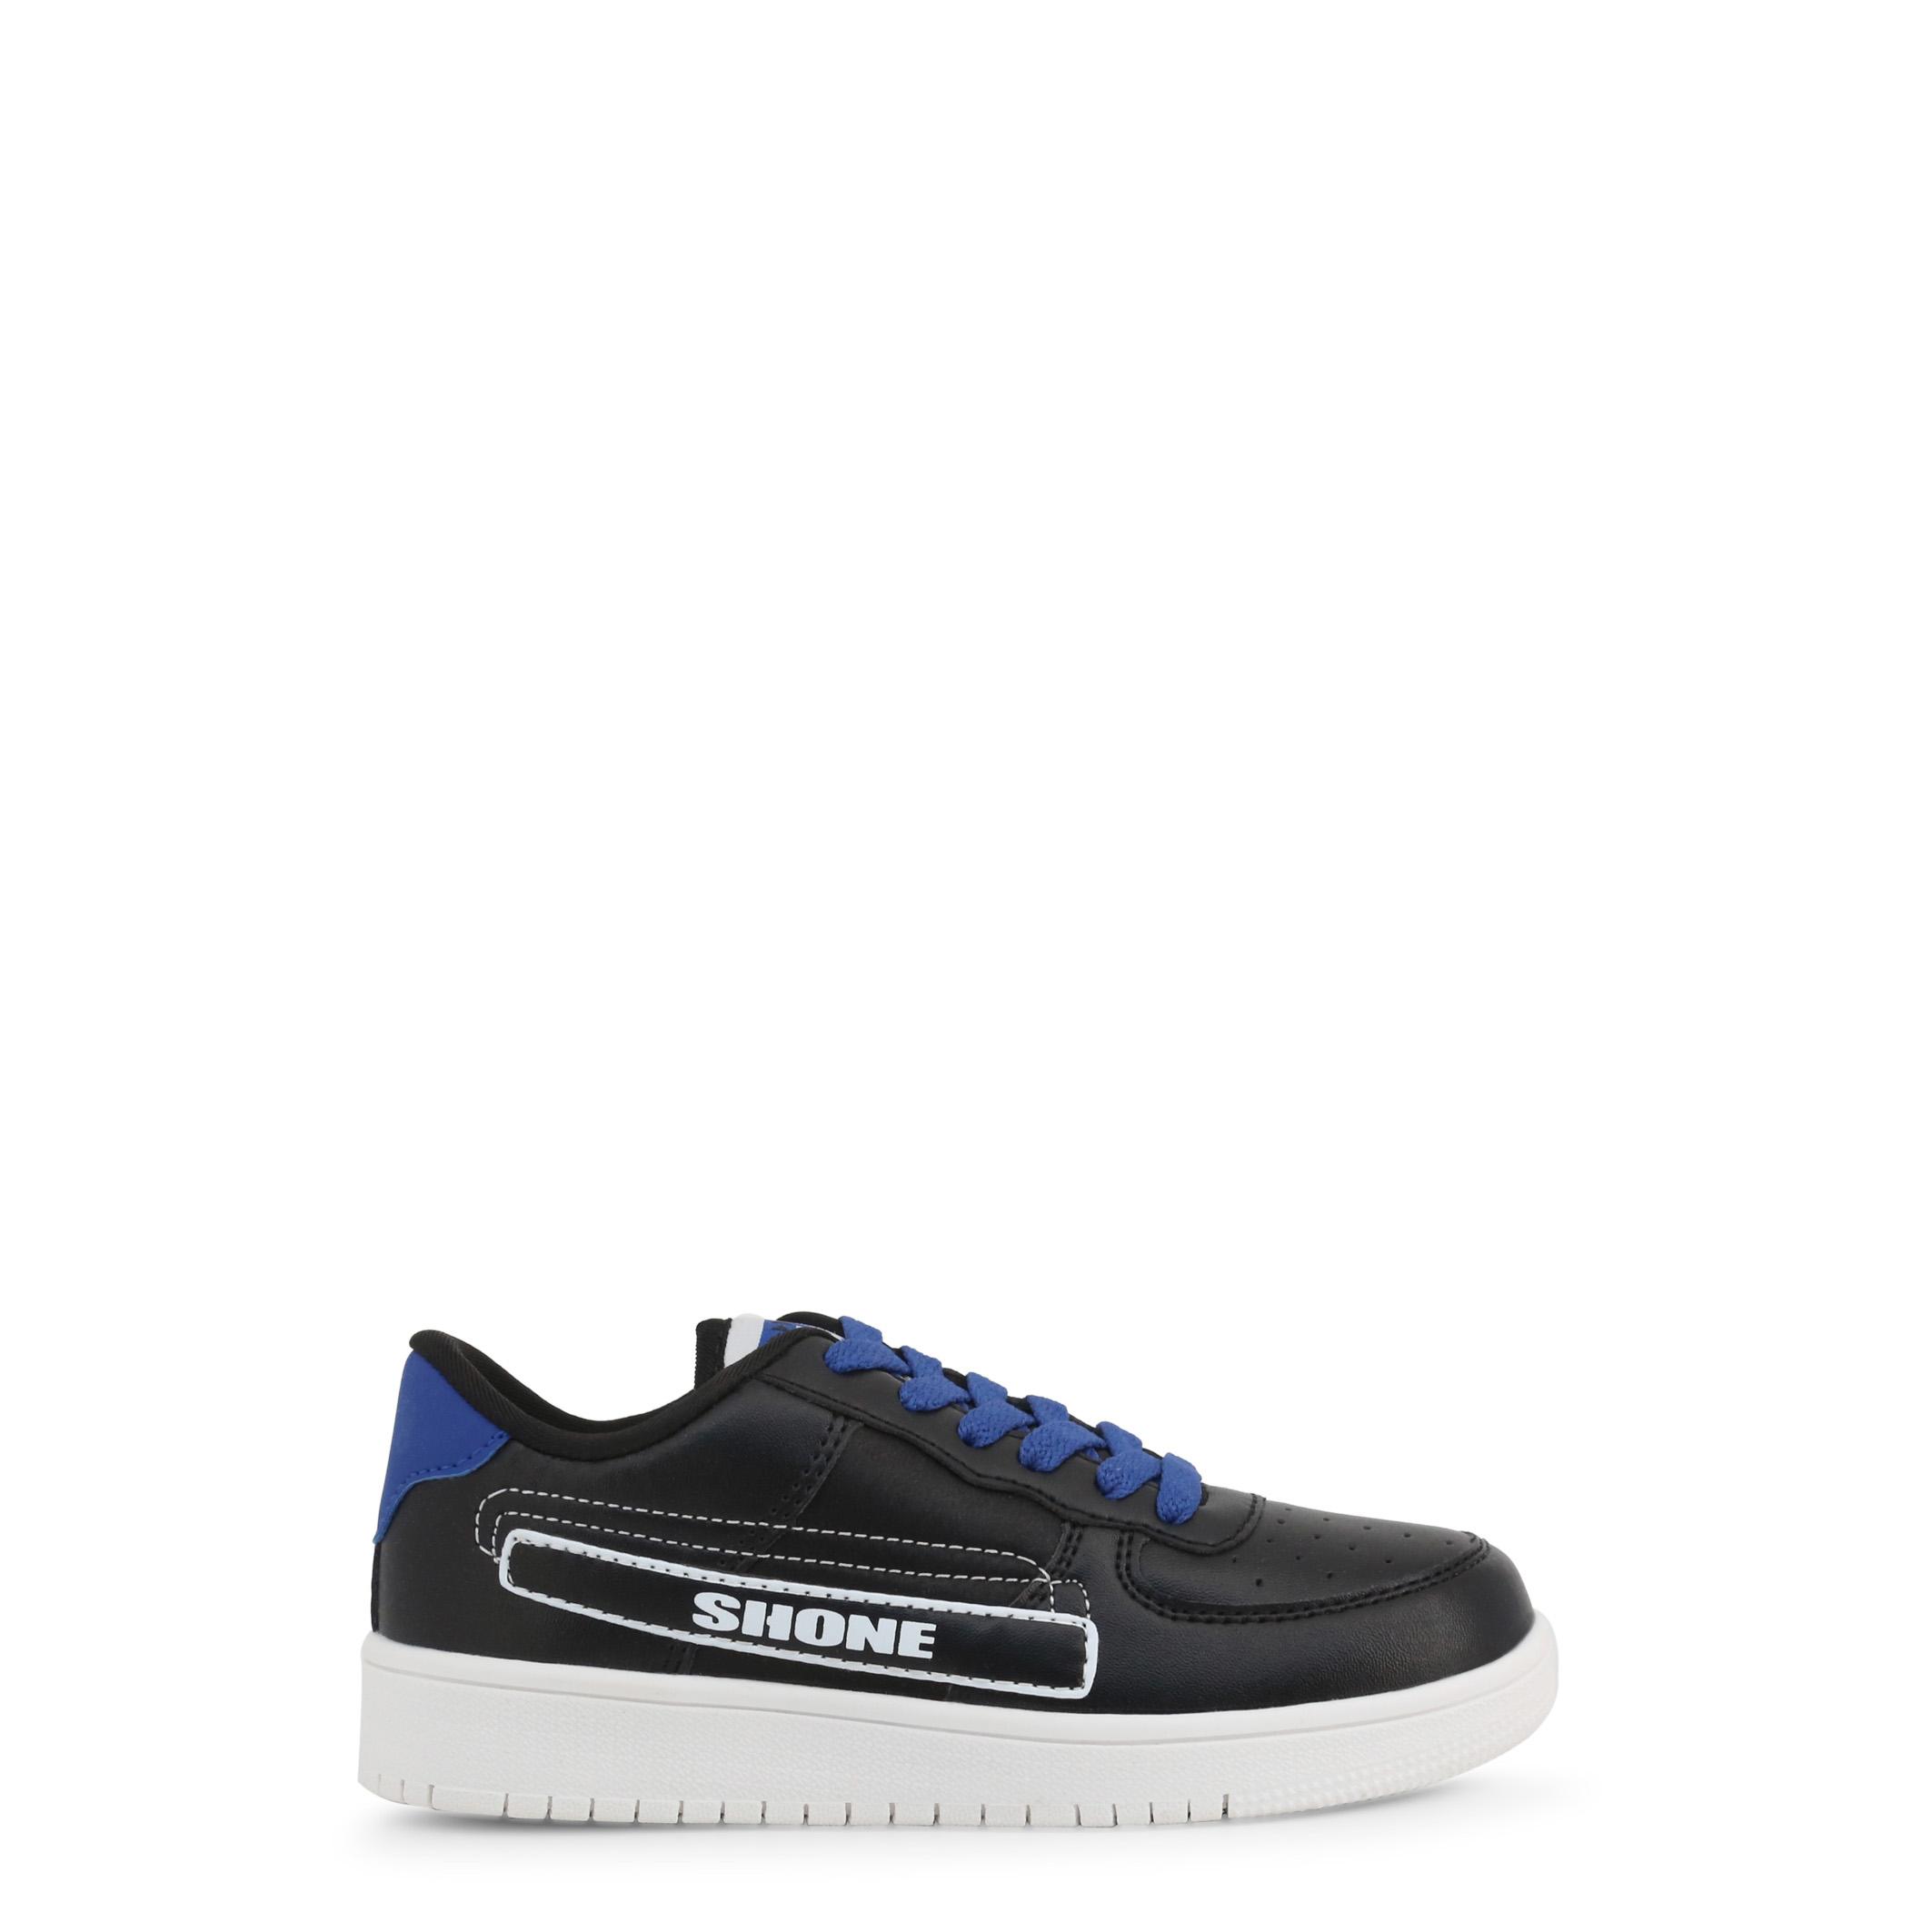 Chaussures Shone – 15012-129